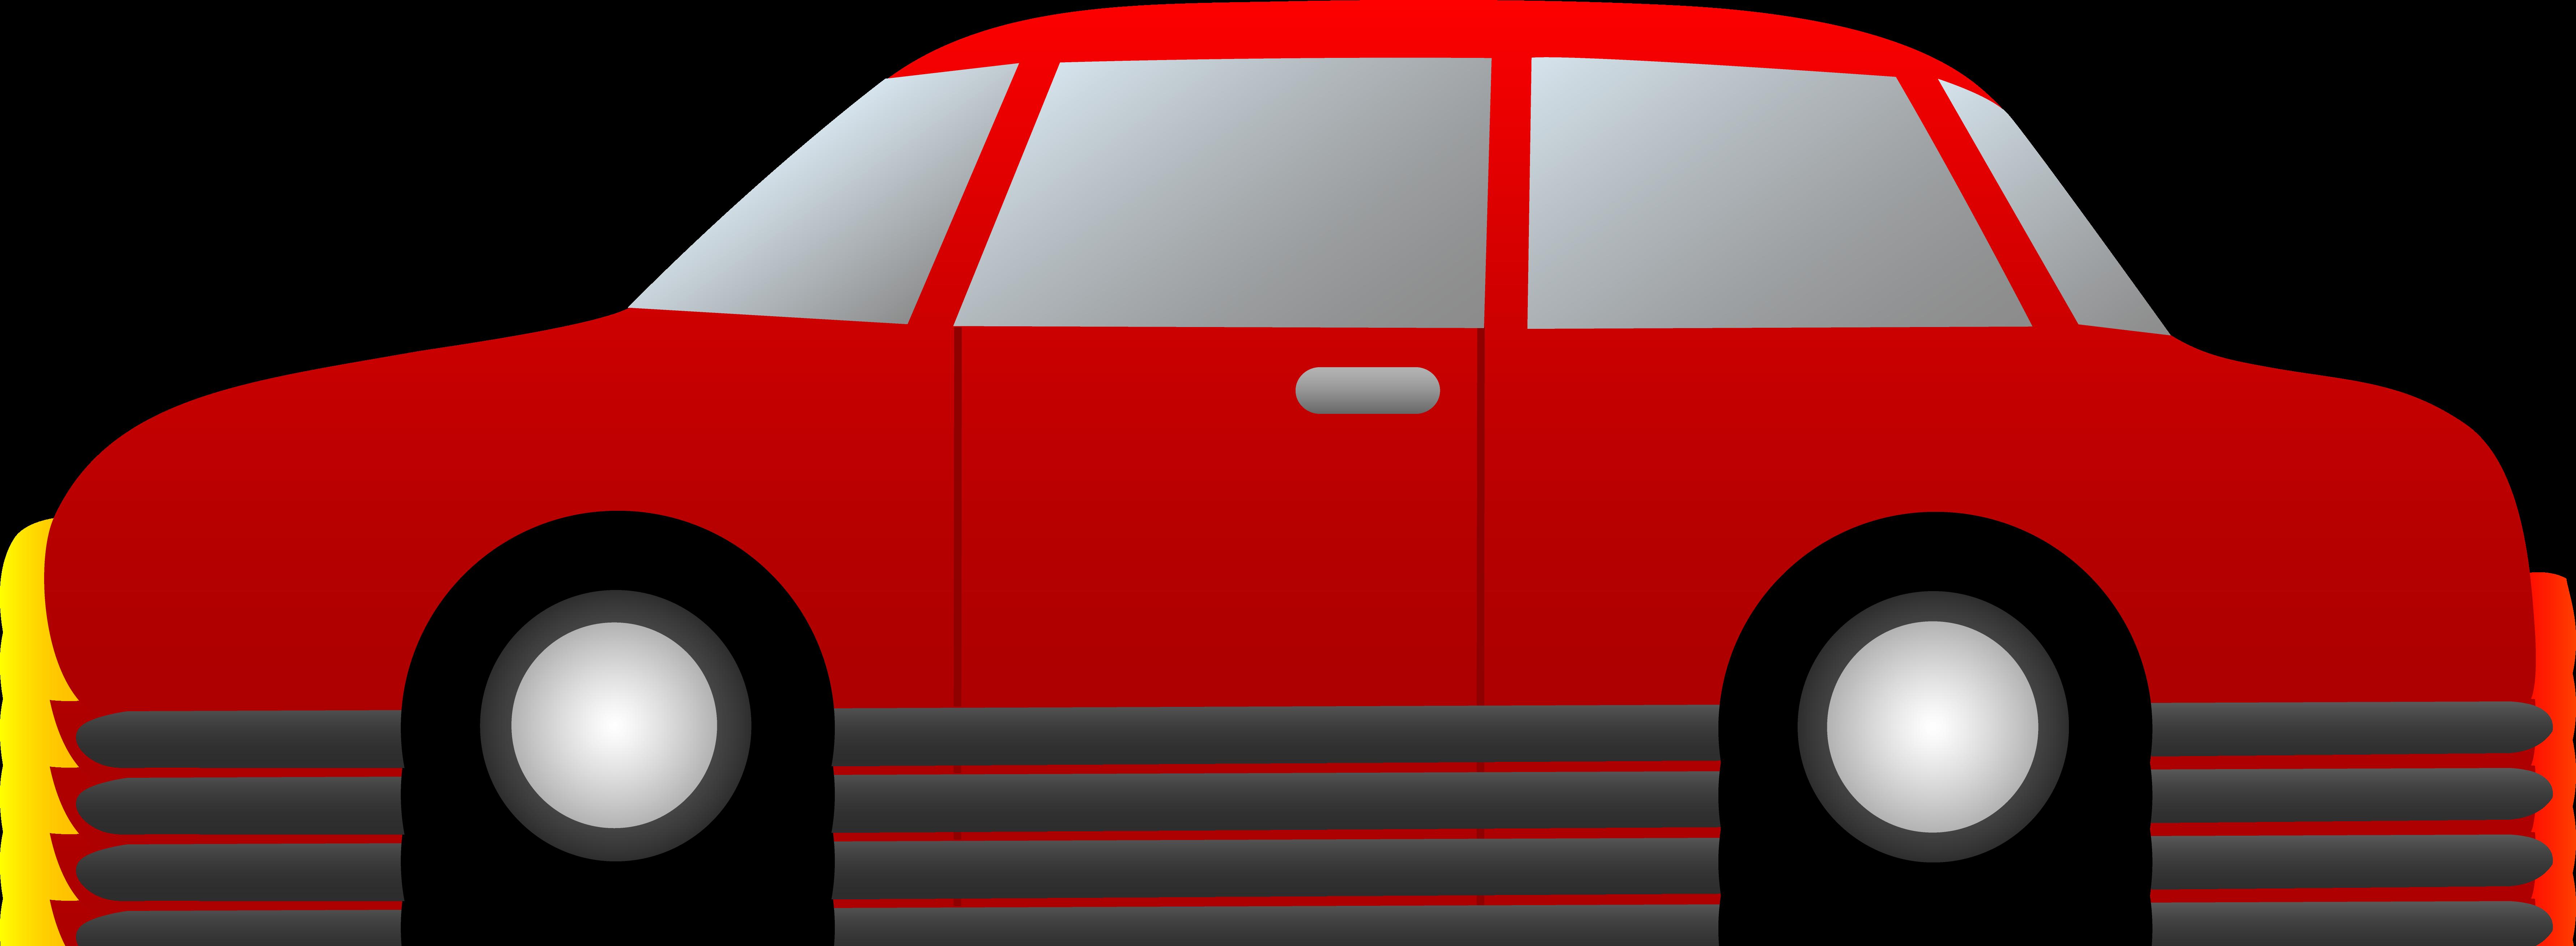 Sports car panda free. Minivan clipart red suv